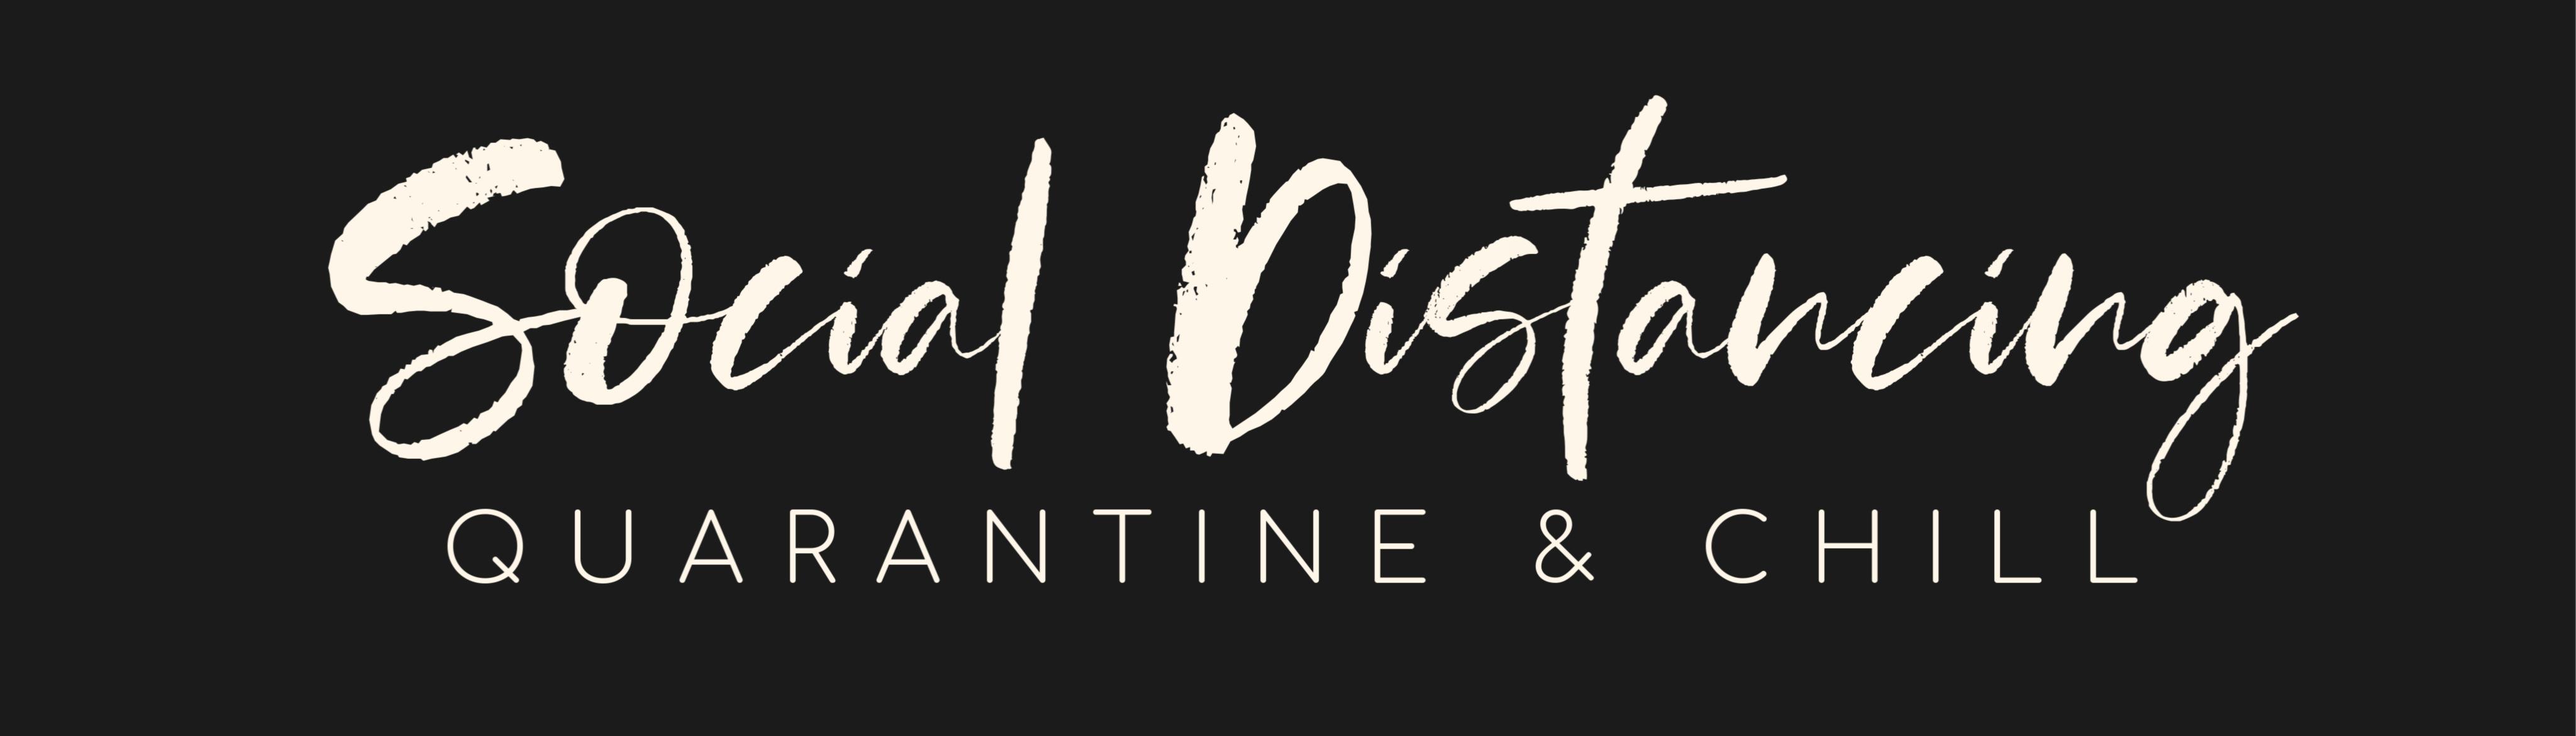 social-distancing-banner.jpg